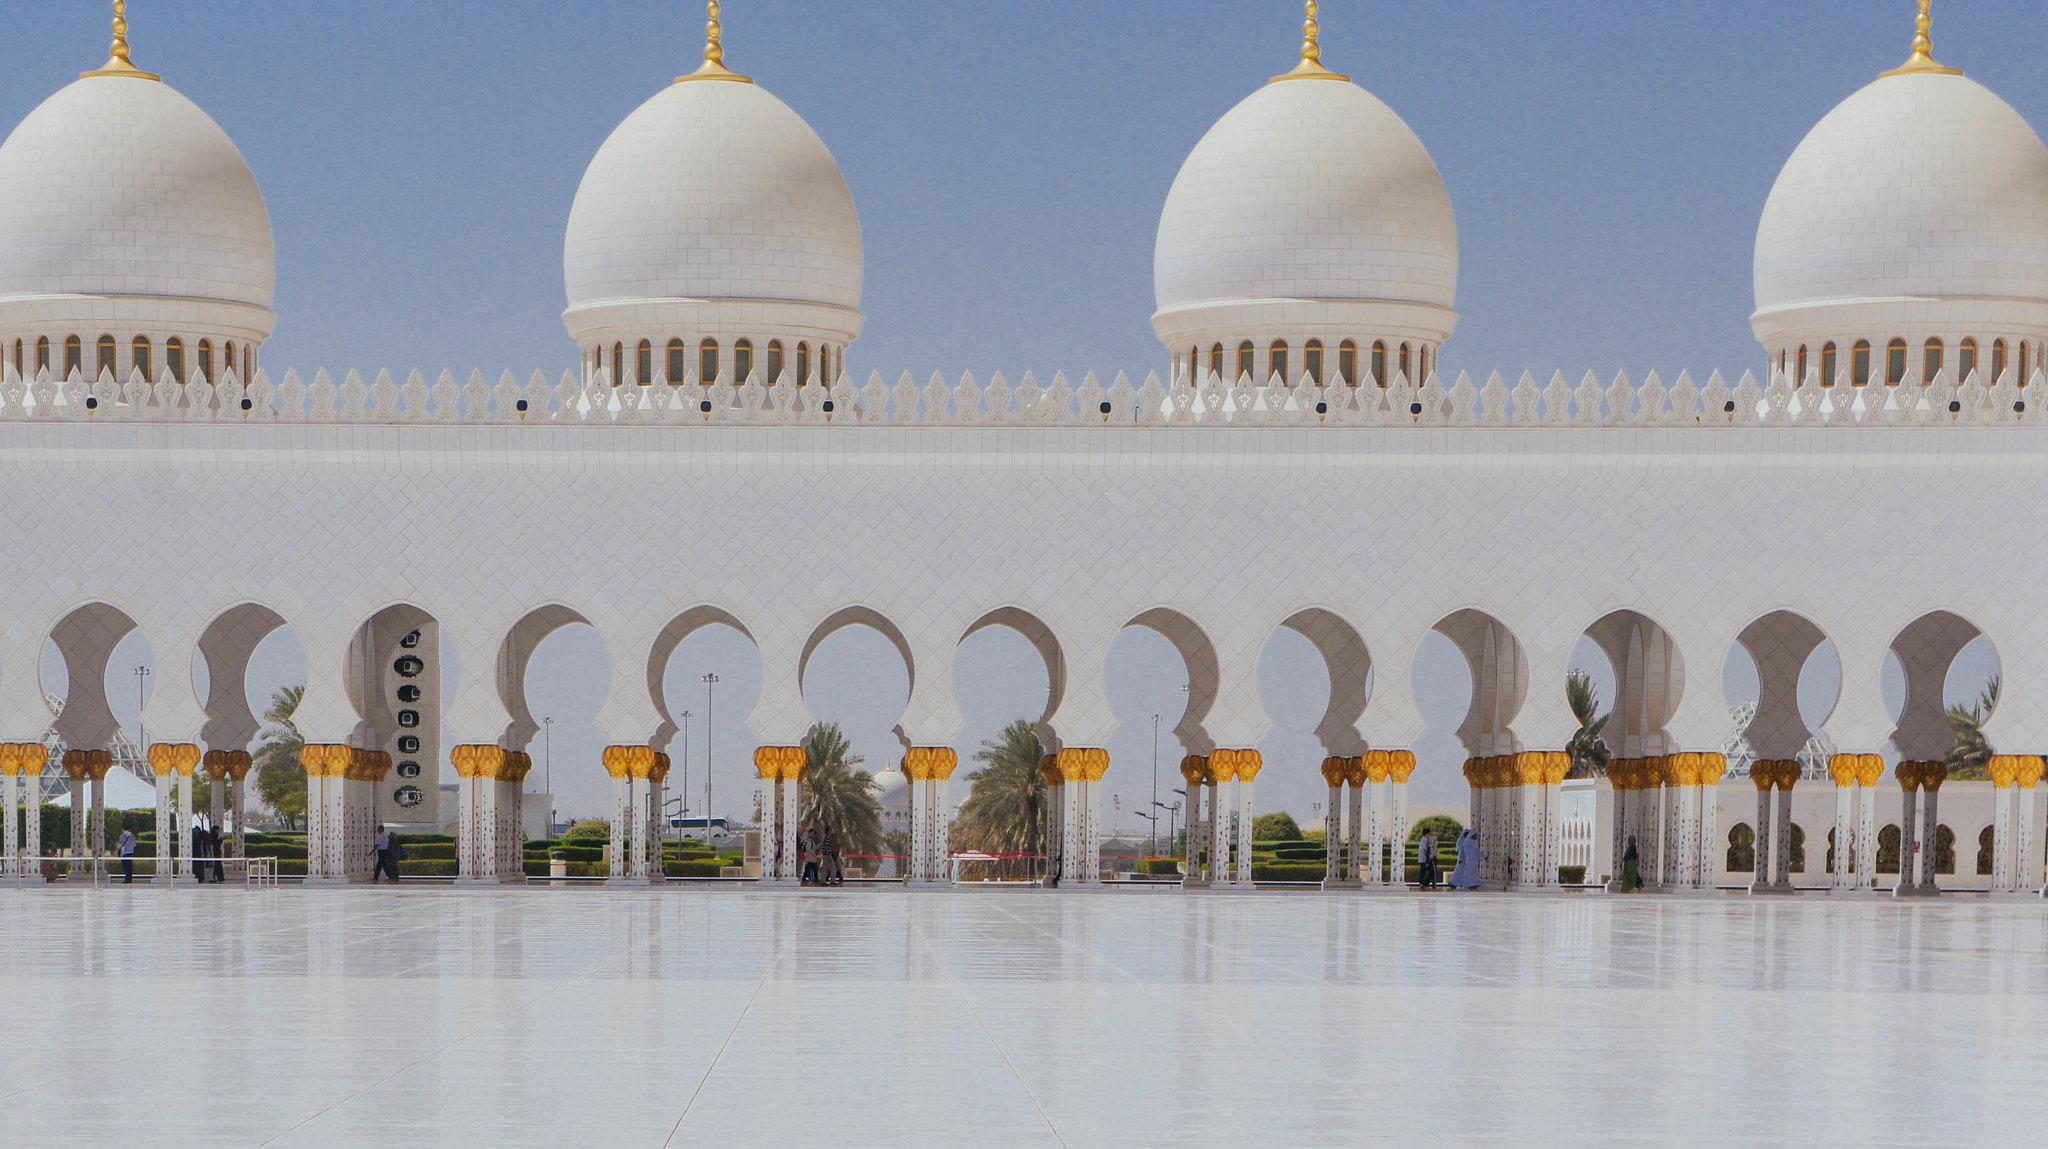 Sheikh Zayed Grand Mosque courtyard